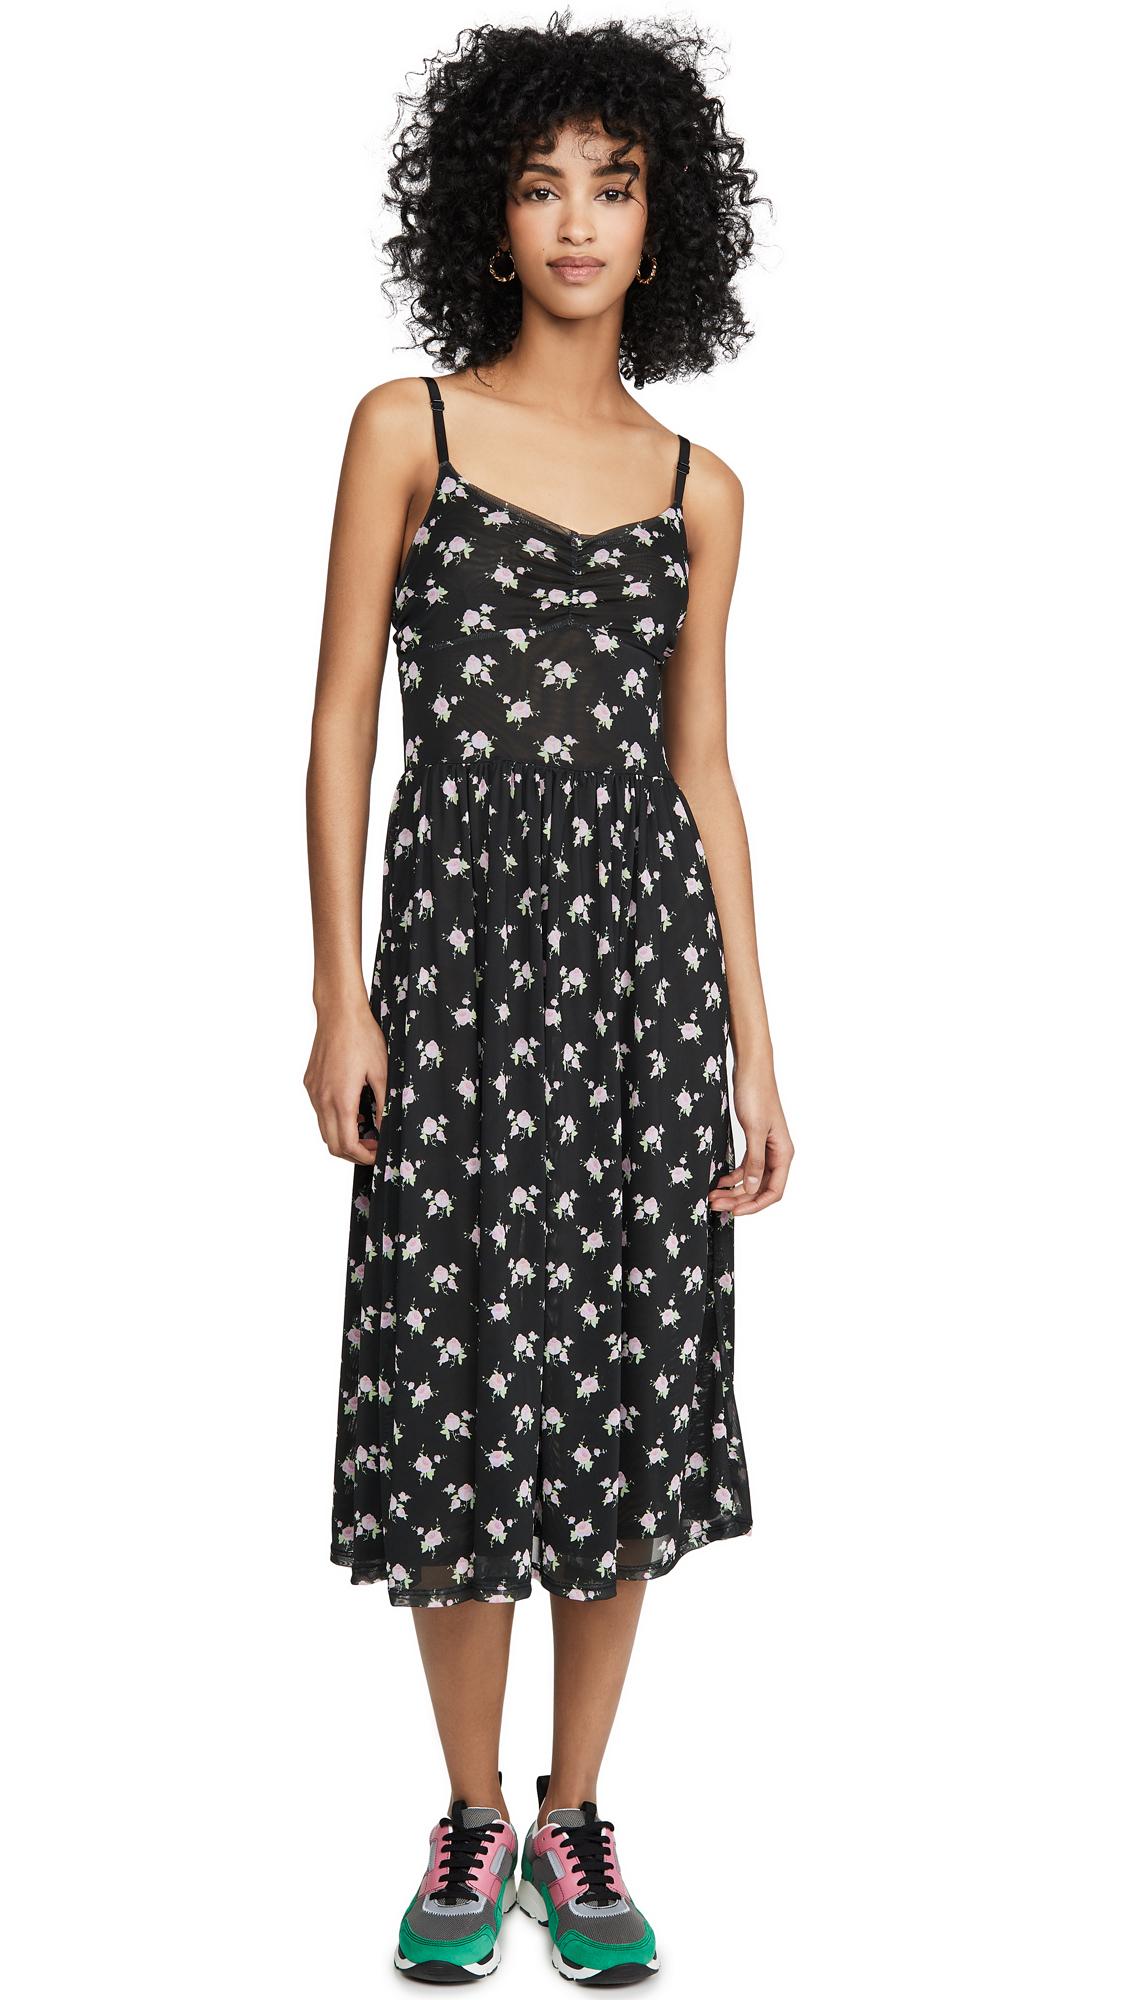 Sandy Liang Misty Dress - 25% Off Sale